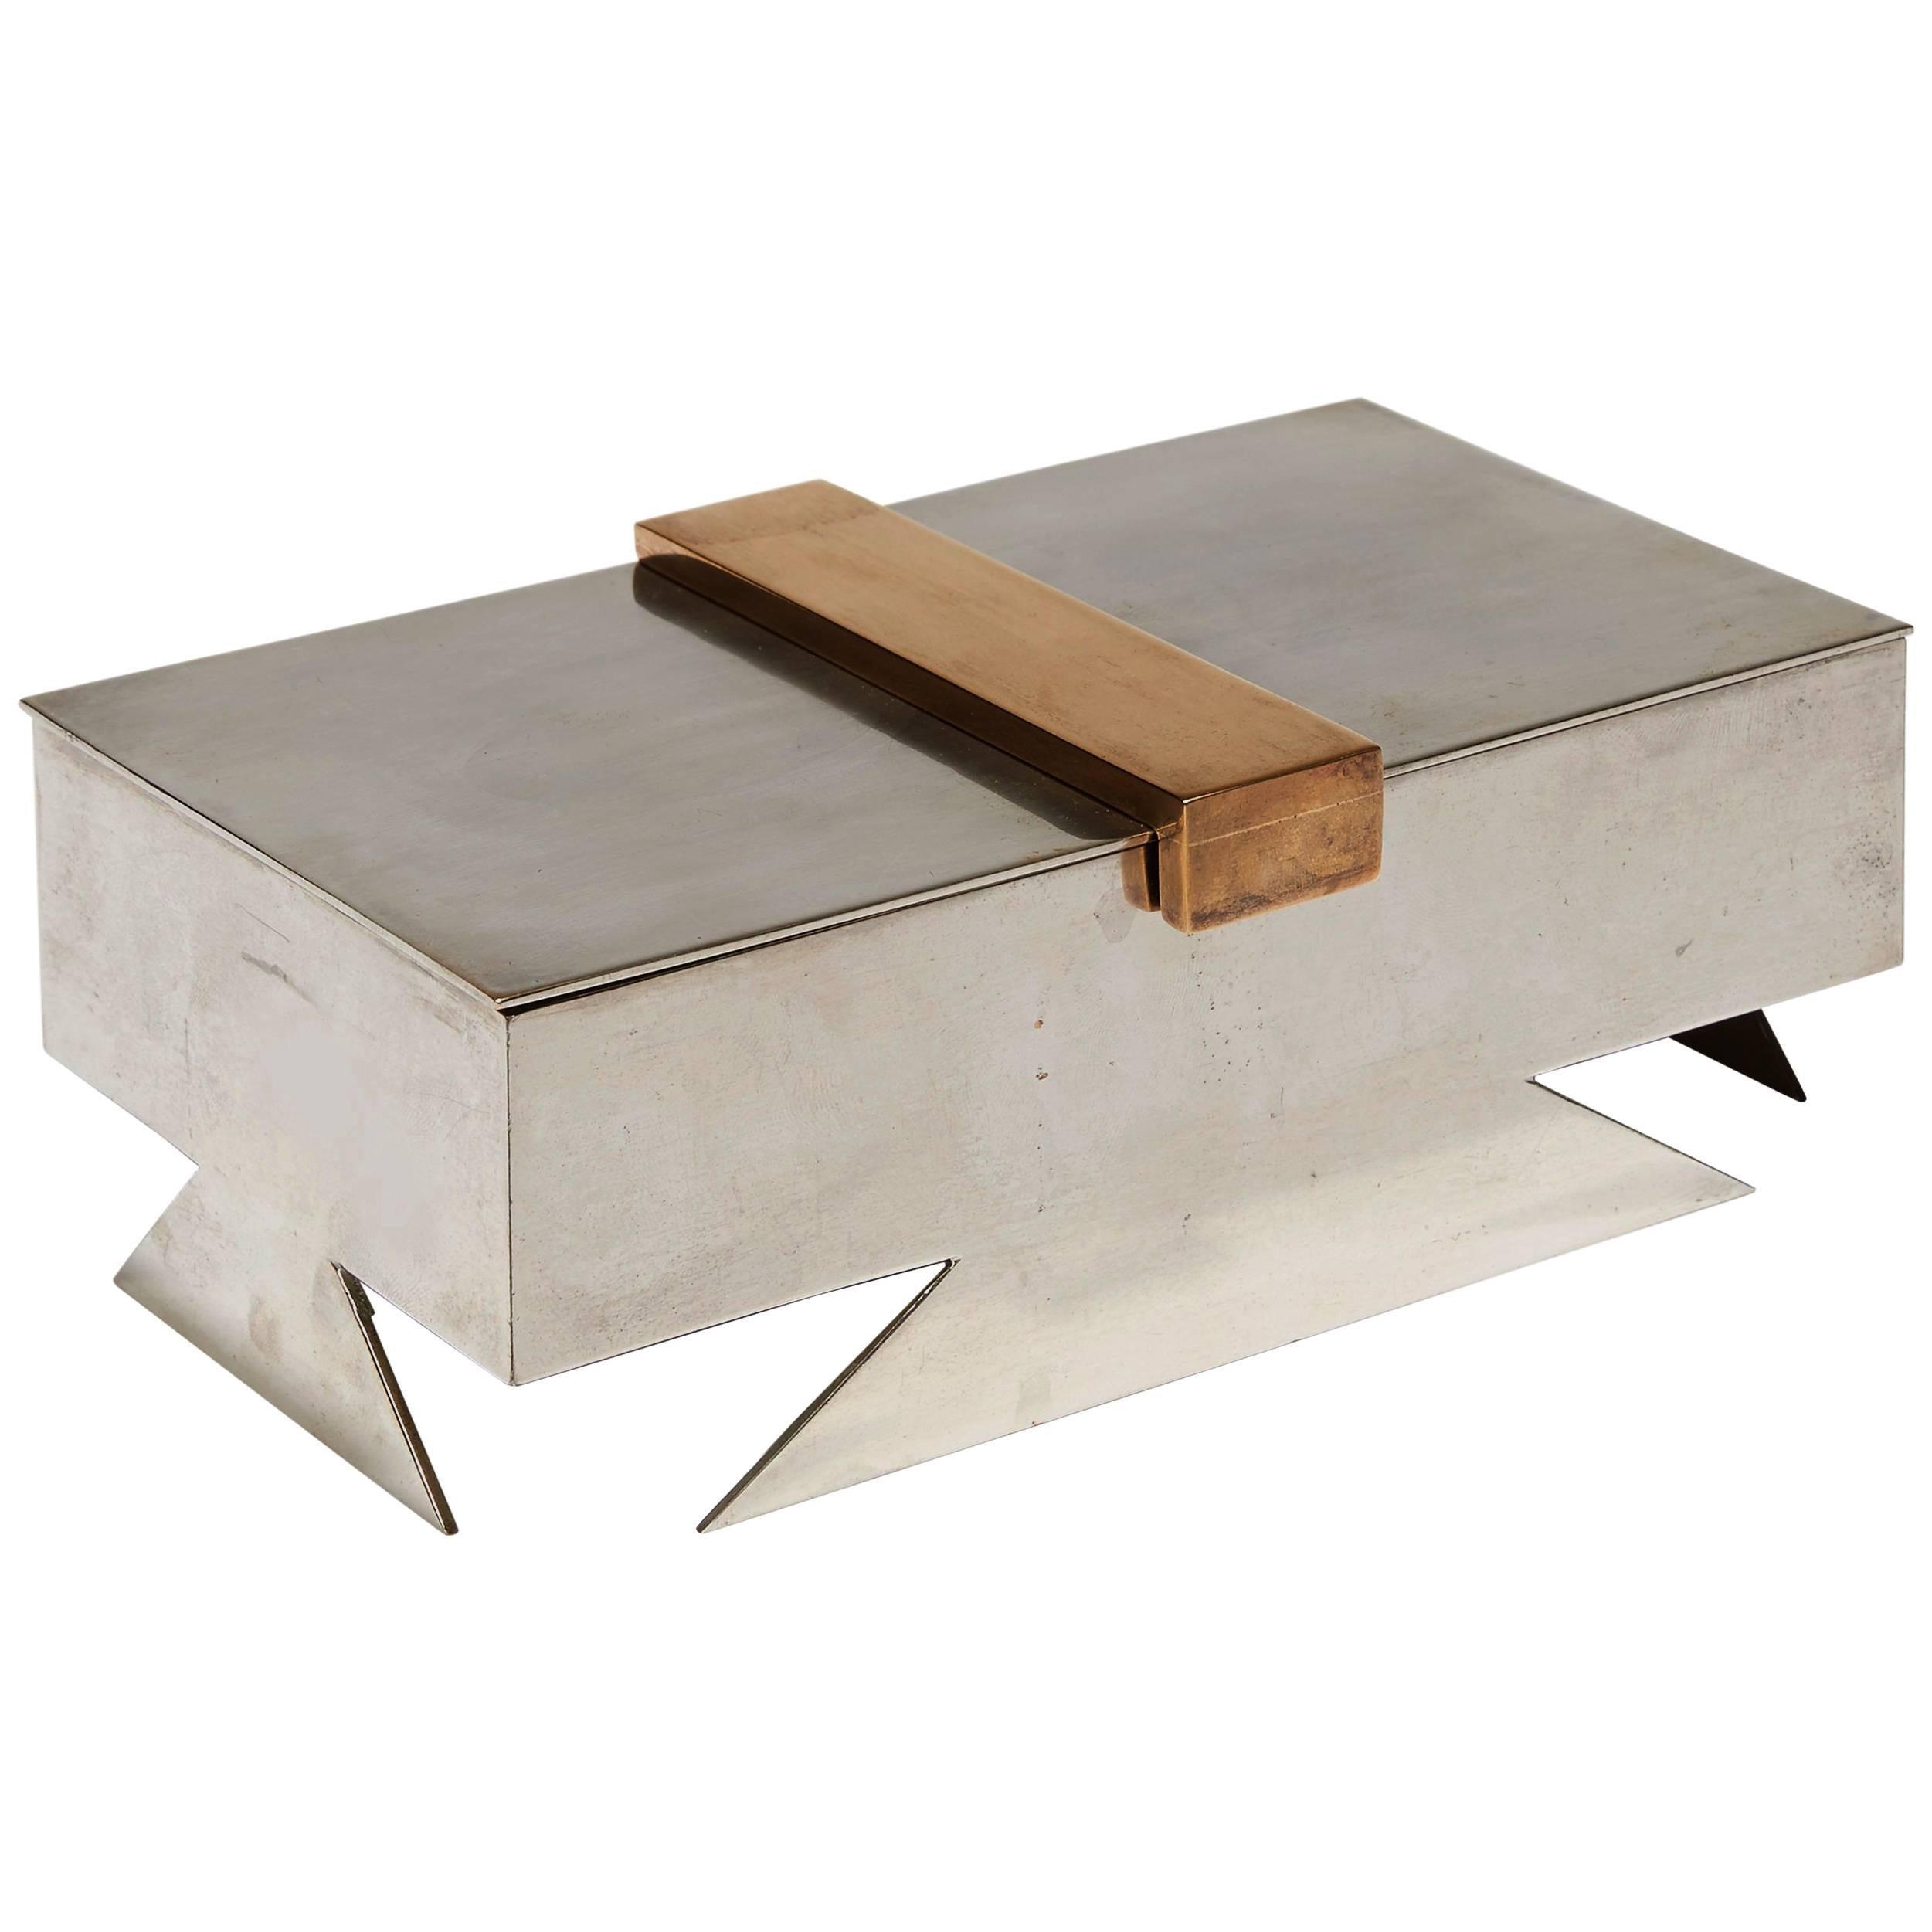 Geometrical box by Maison Desny, circa 1930